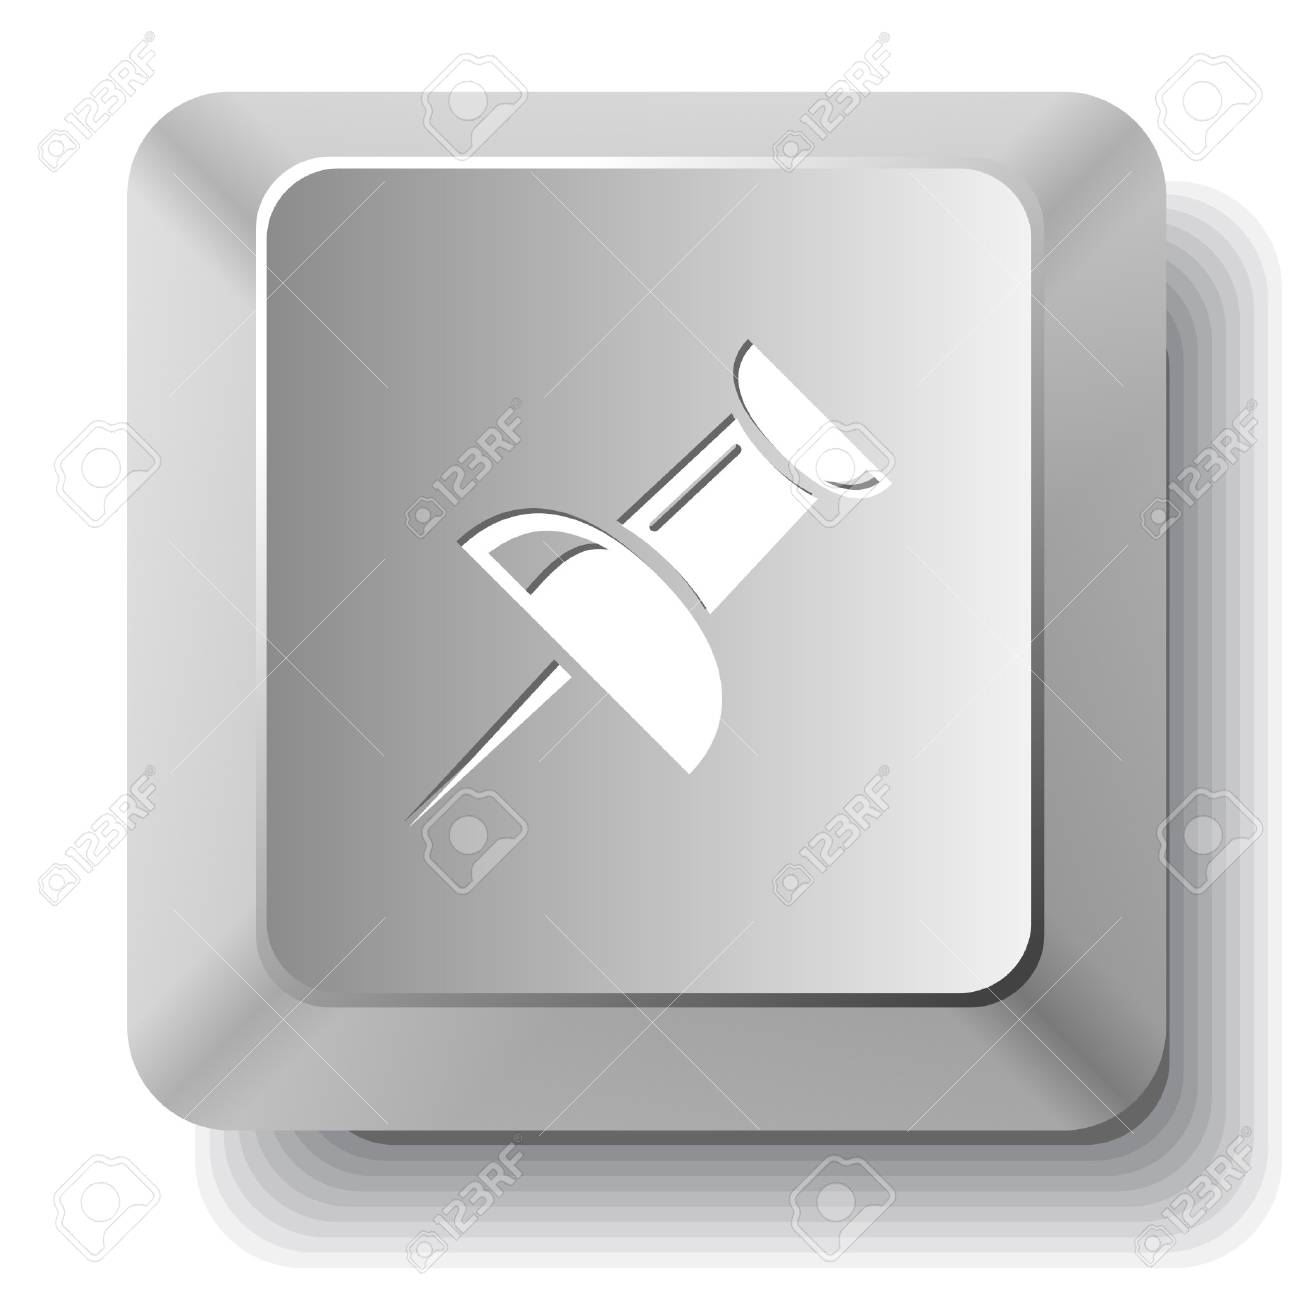 Push pin. computer key. Stock Vector - 7522621